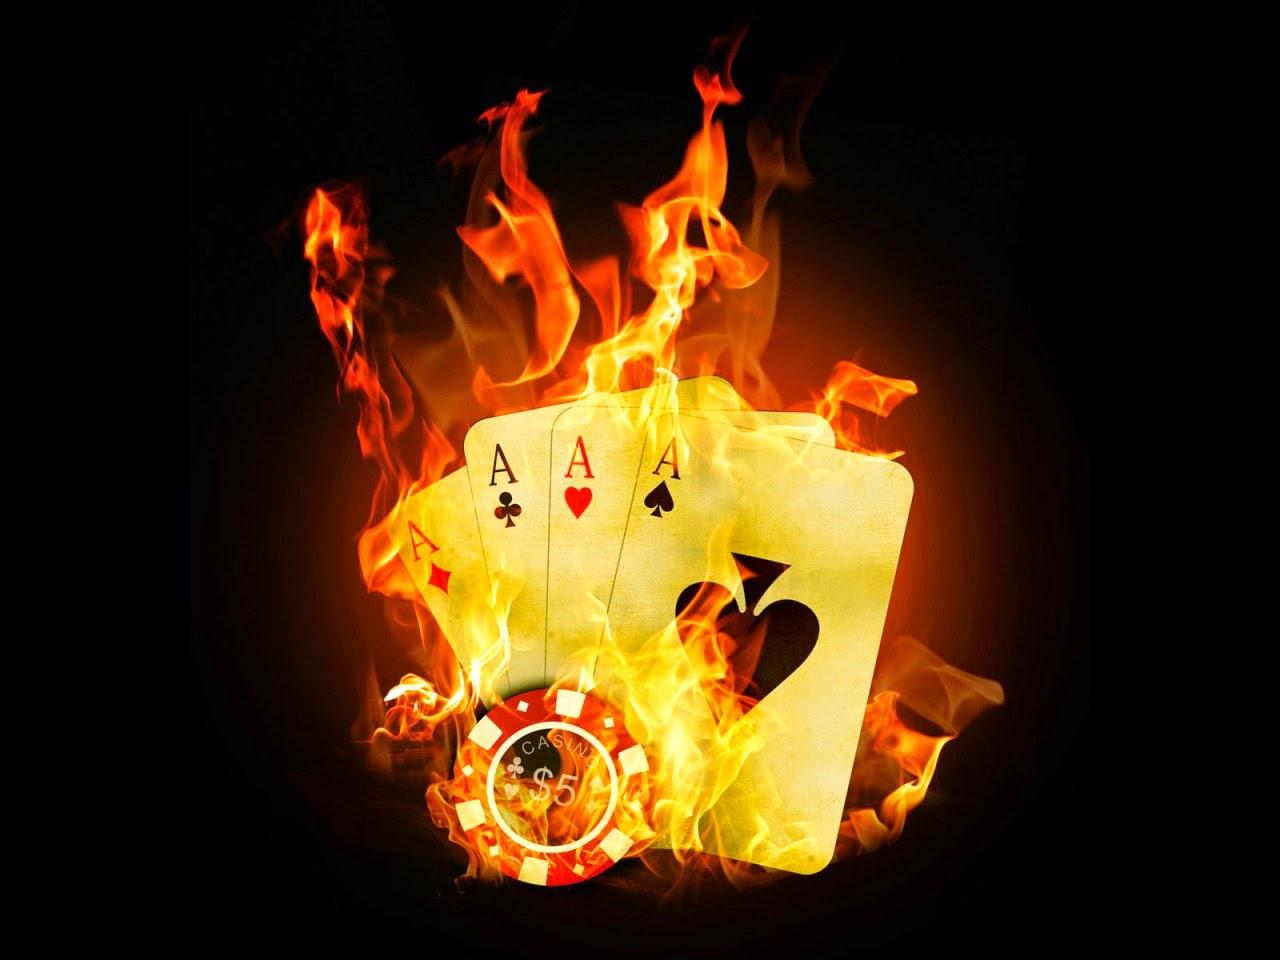 Hot News PokerKiuKiu: Panduan JITU Menang Poker